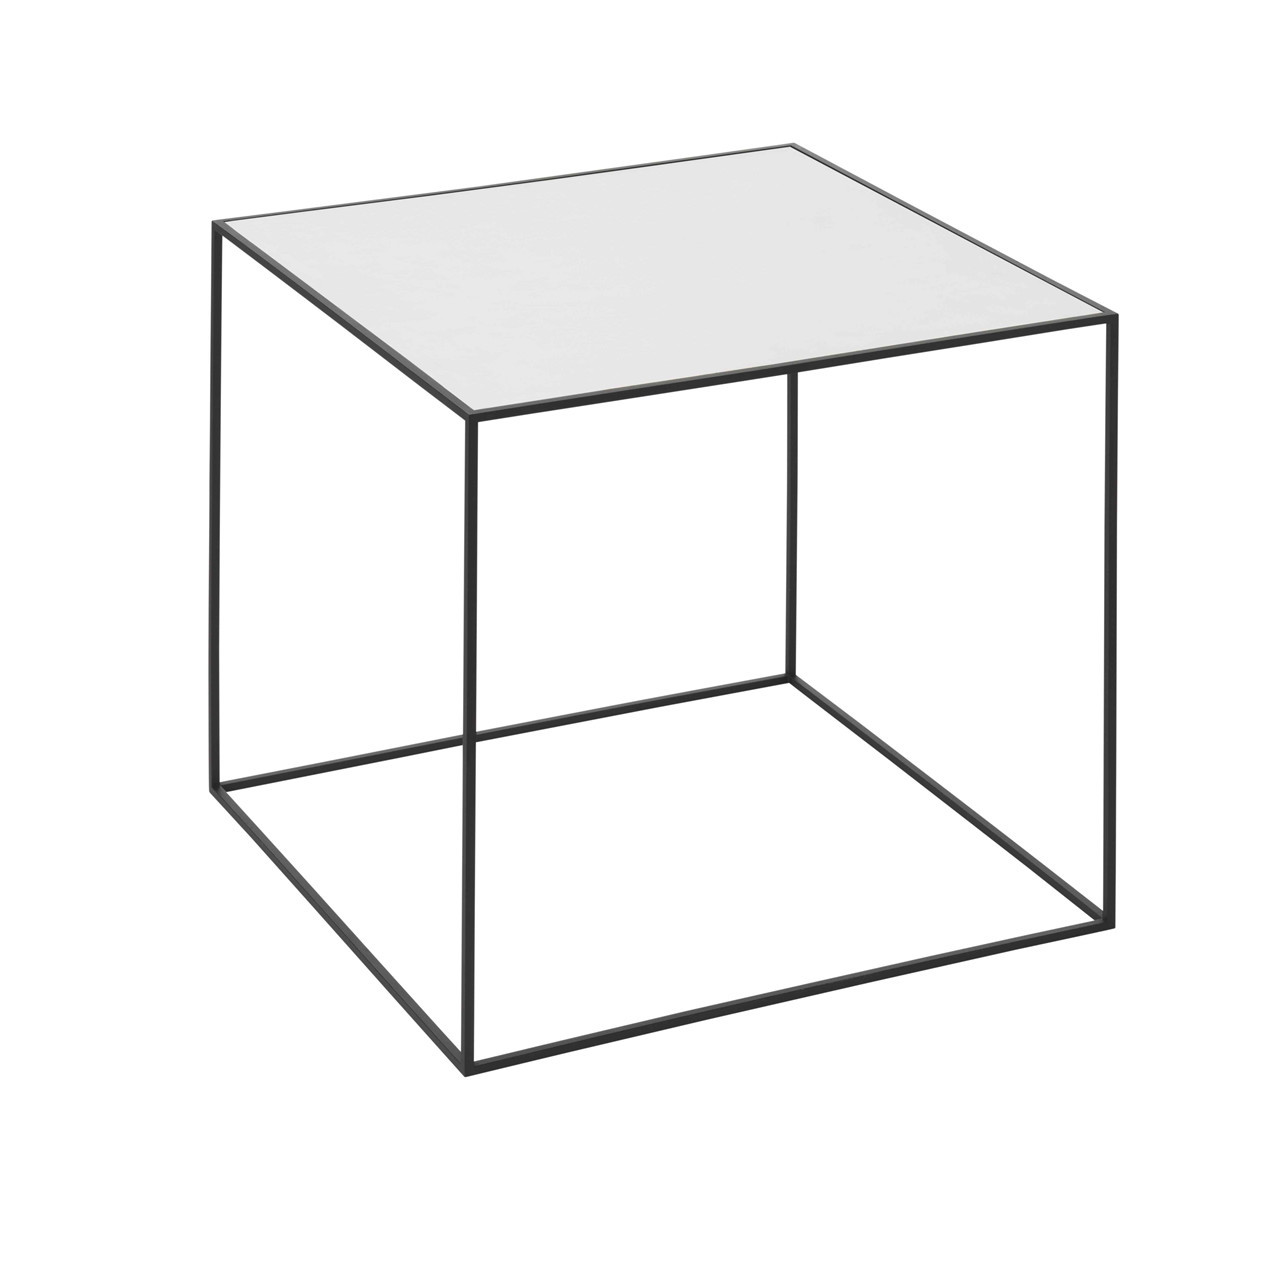 By Lassen Twin Table 42 hvid/eg – pris 1999.00